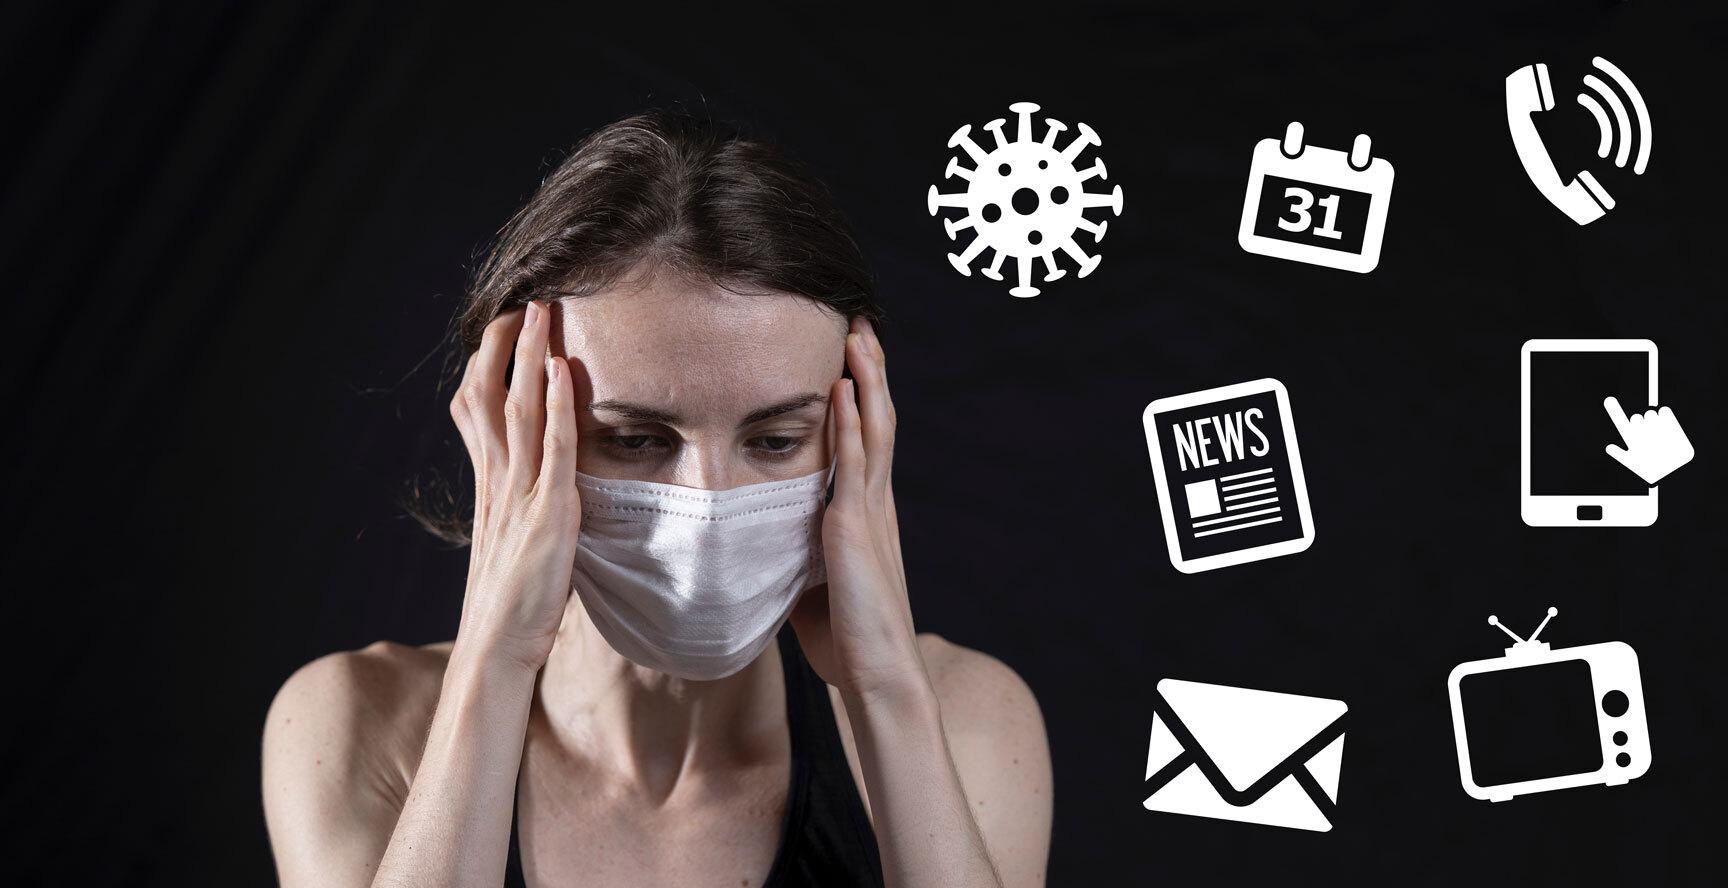 Women feeling stressed and overwhelmed